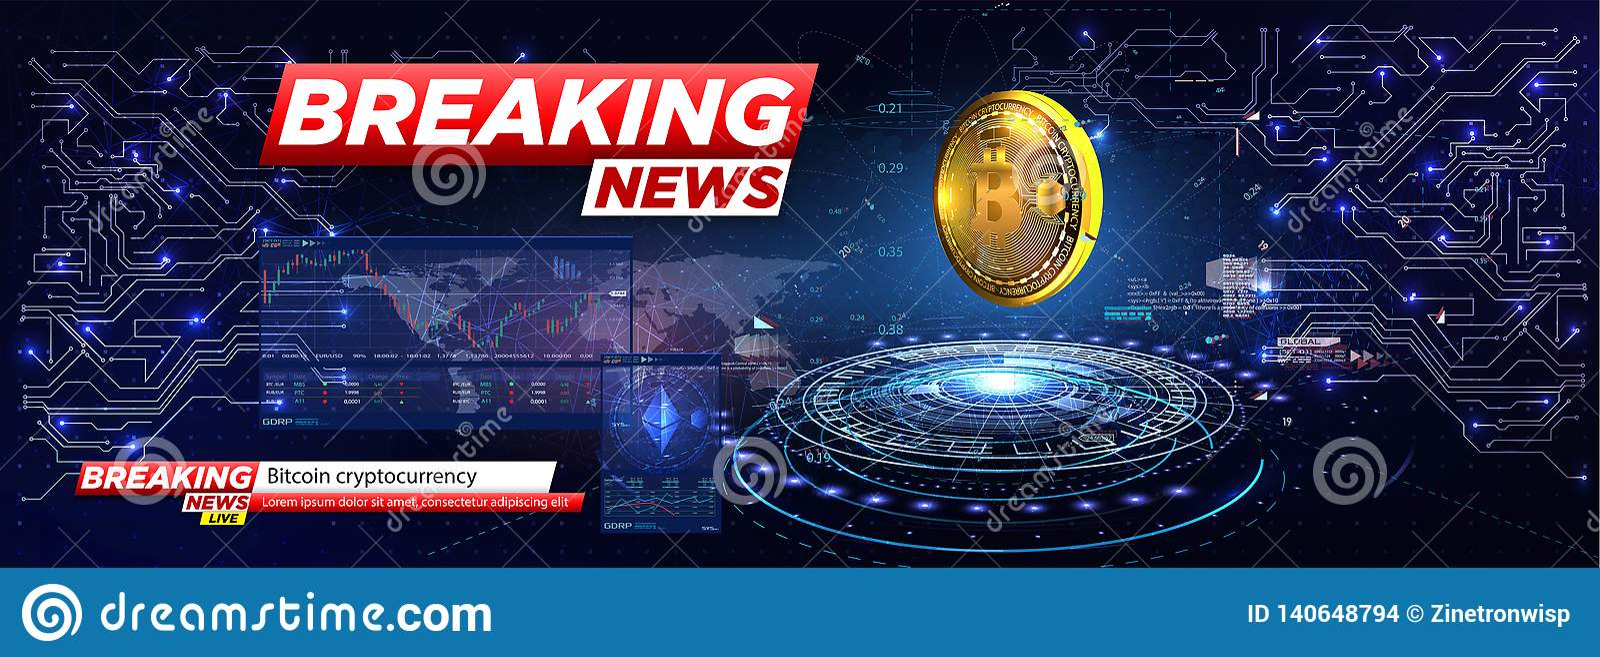 bitcoin breaking news)